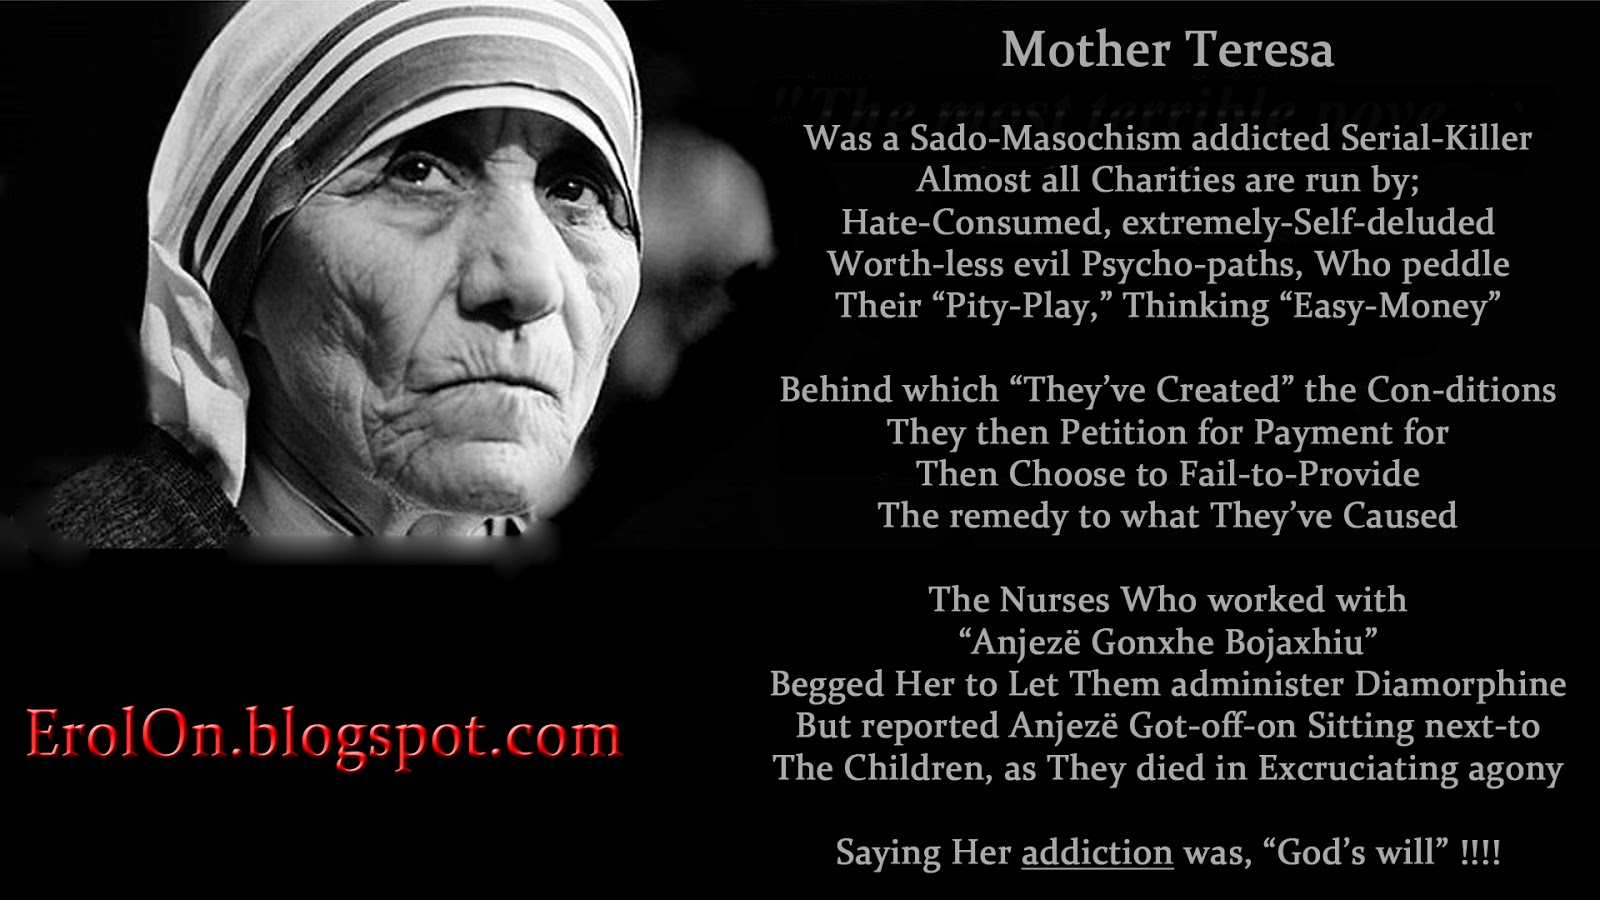 Mother teresa lost faith